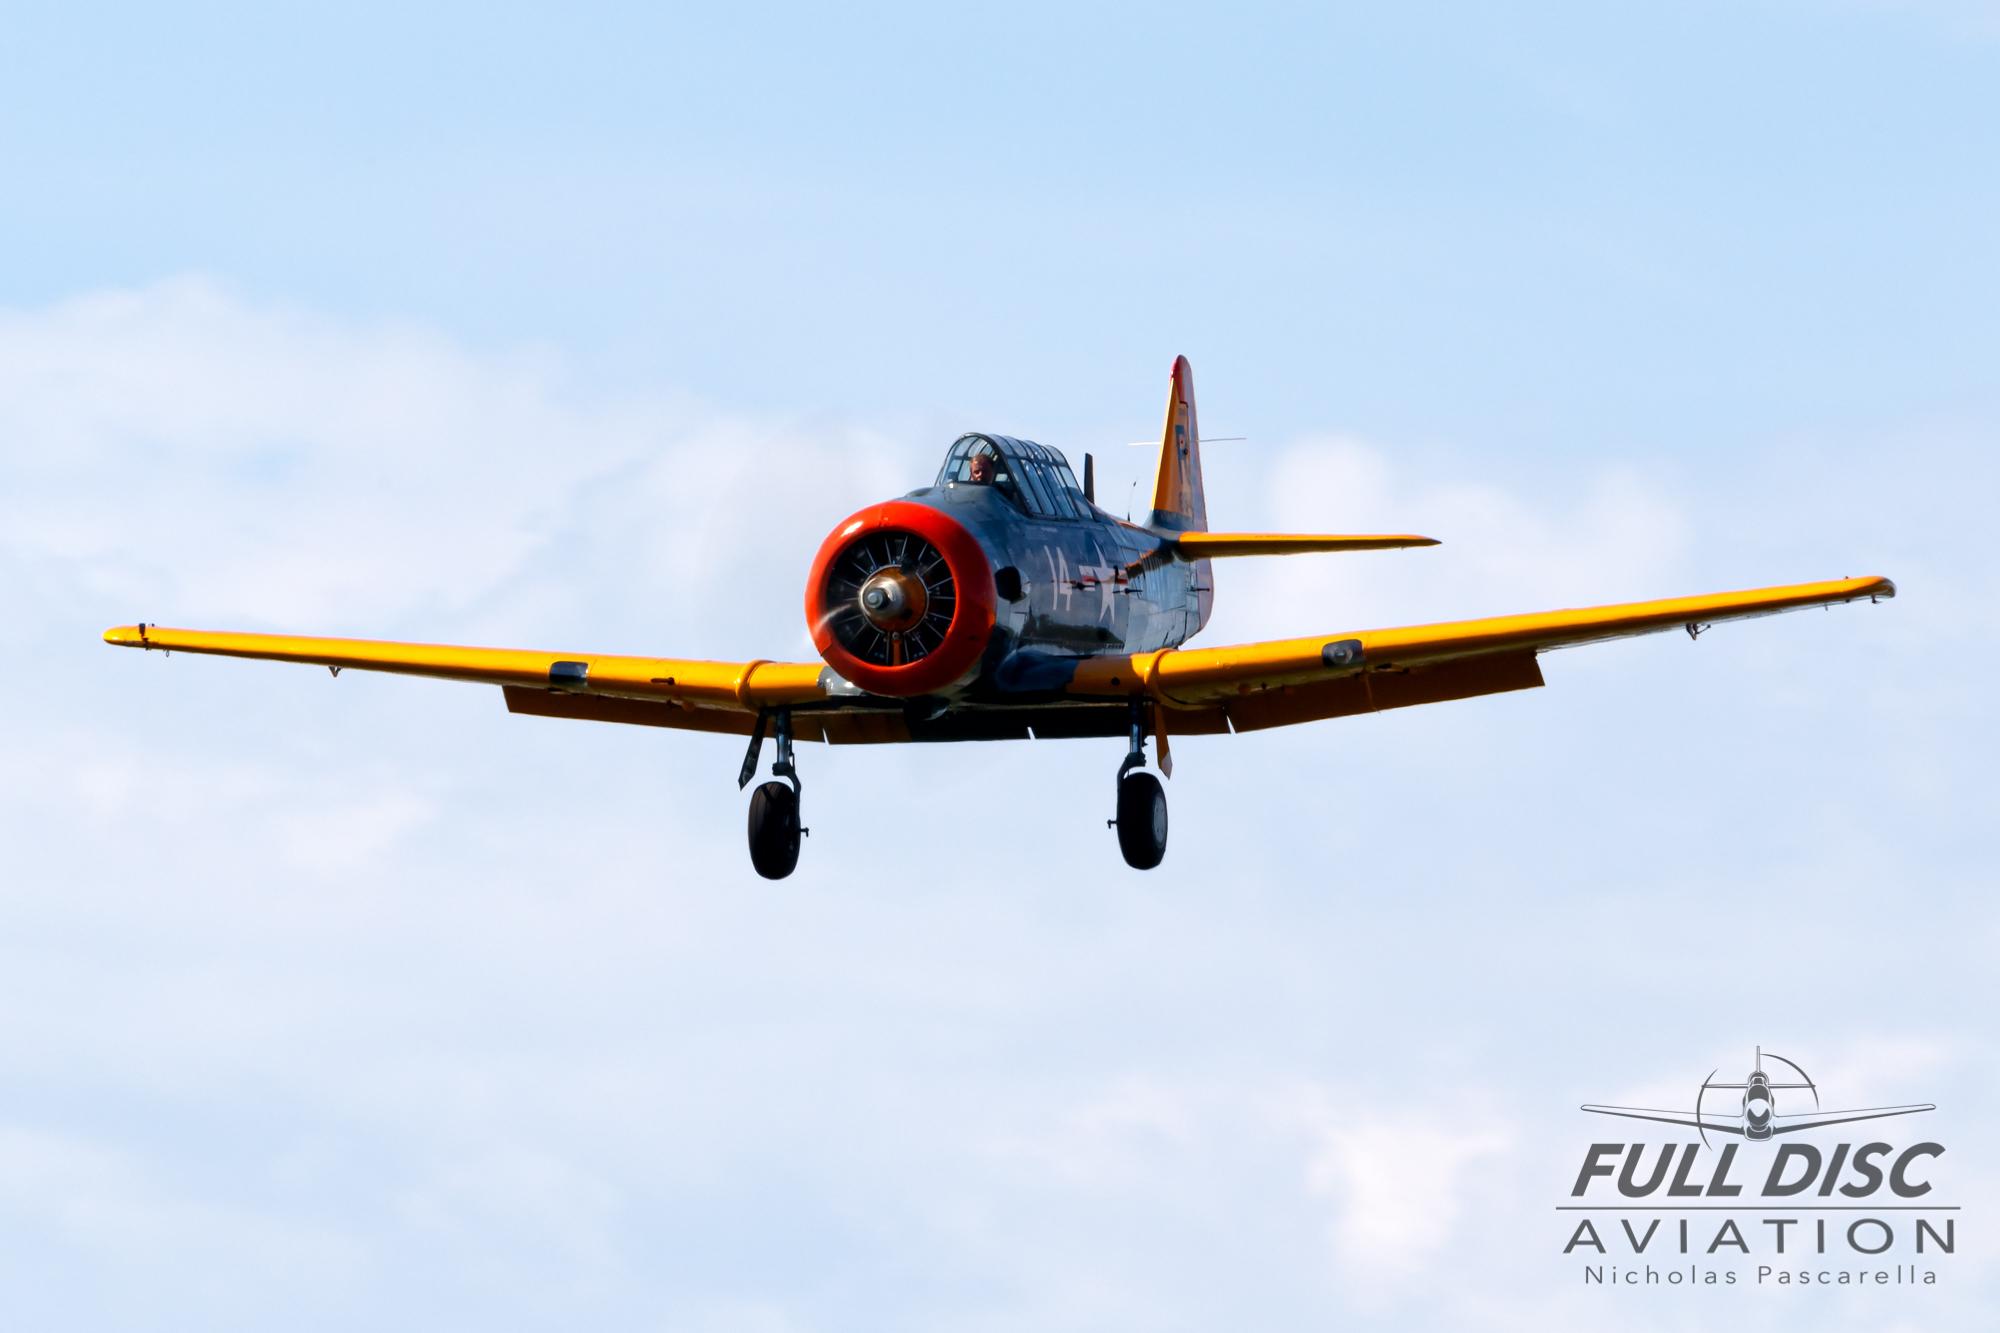 americanairpowermuseum_nicholaspascarella_nickpascarella_fulldiscaviation_legendsofairpower2019_aviation_warbird_t6_landing_grey_orange.jpg